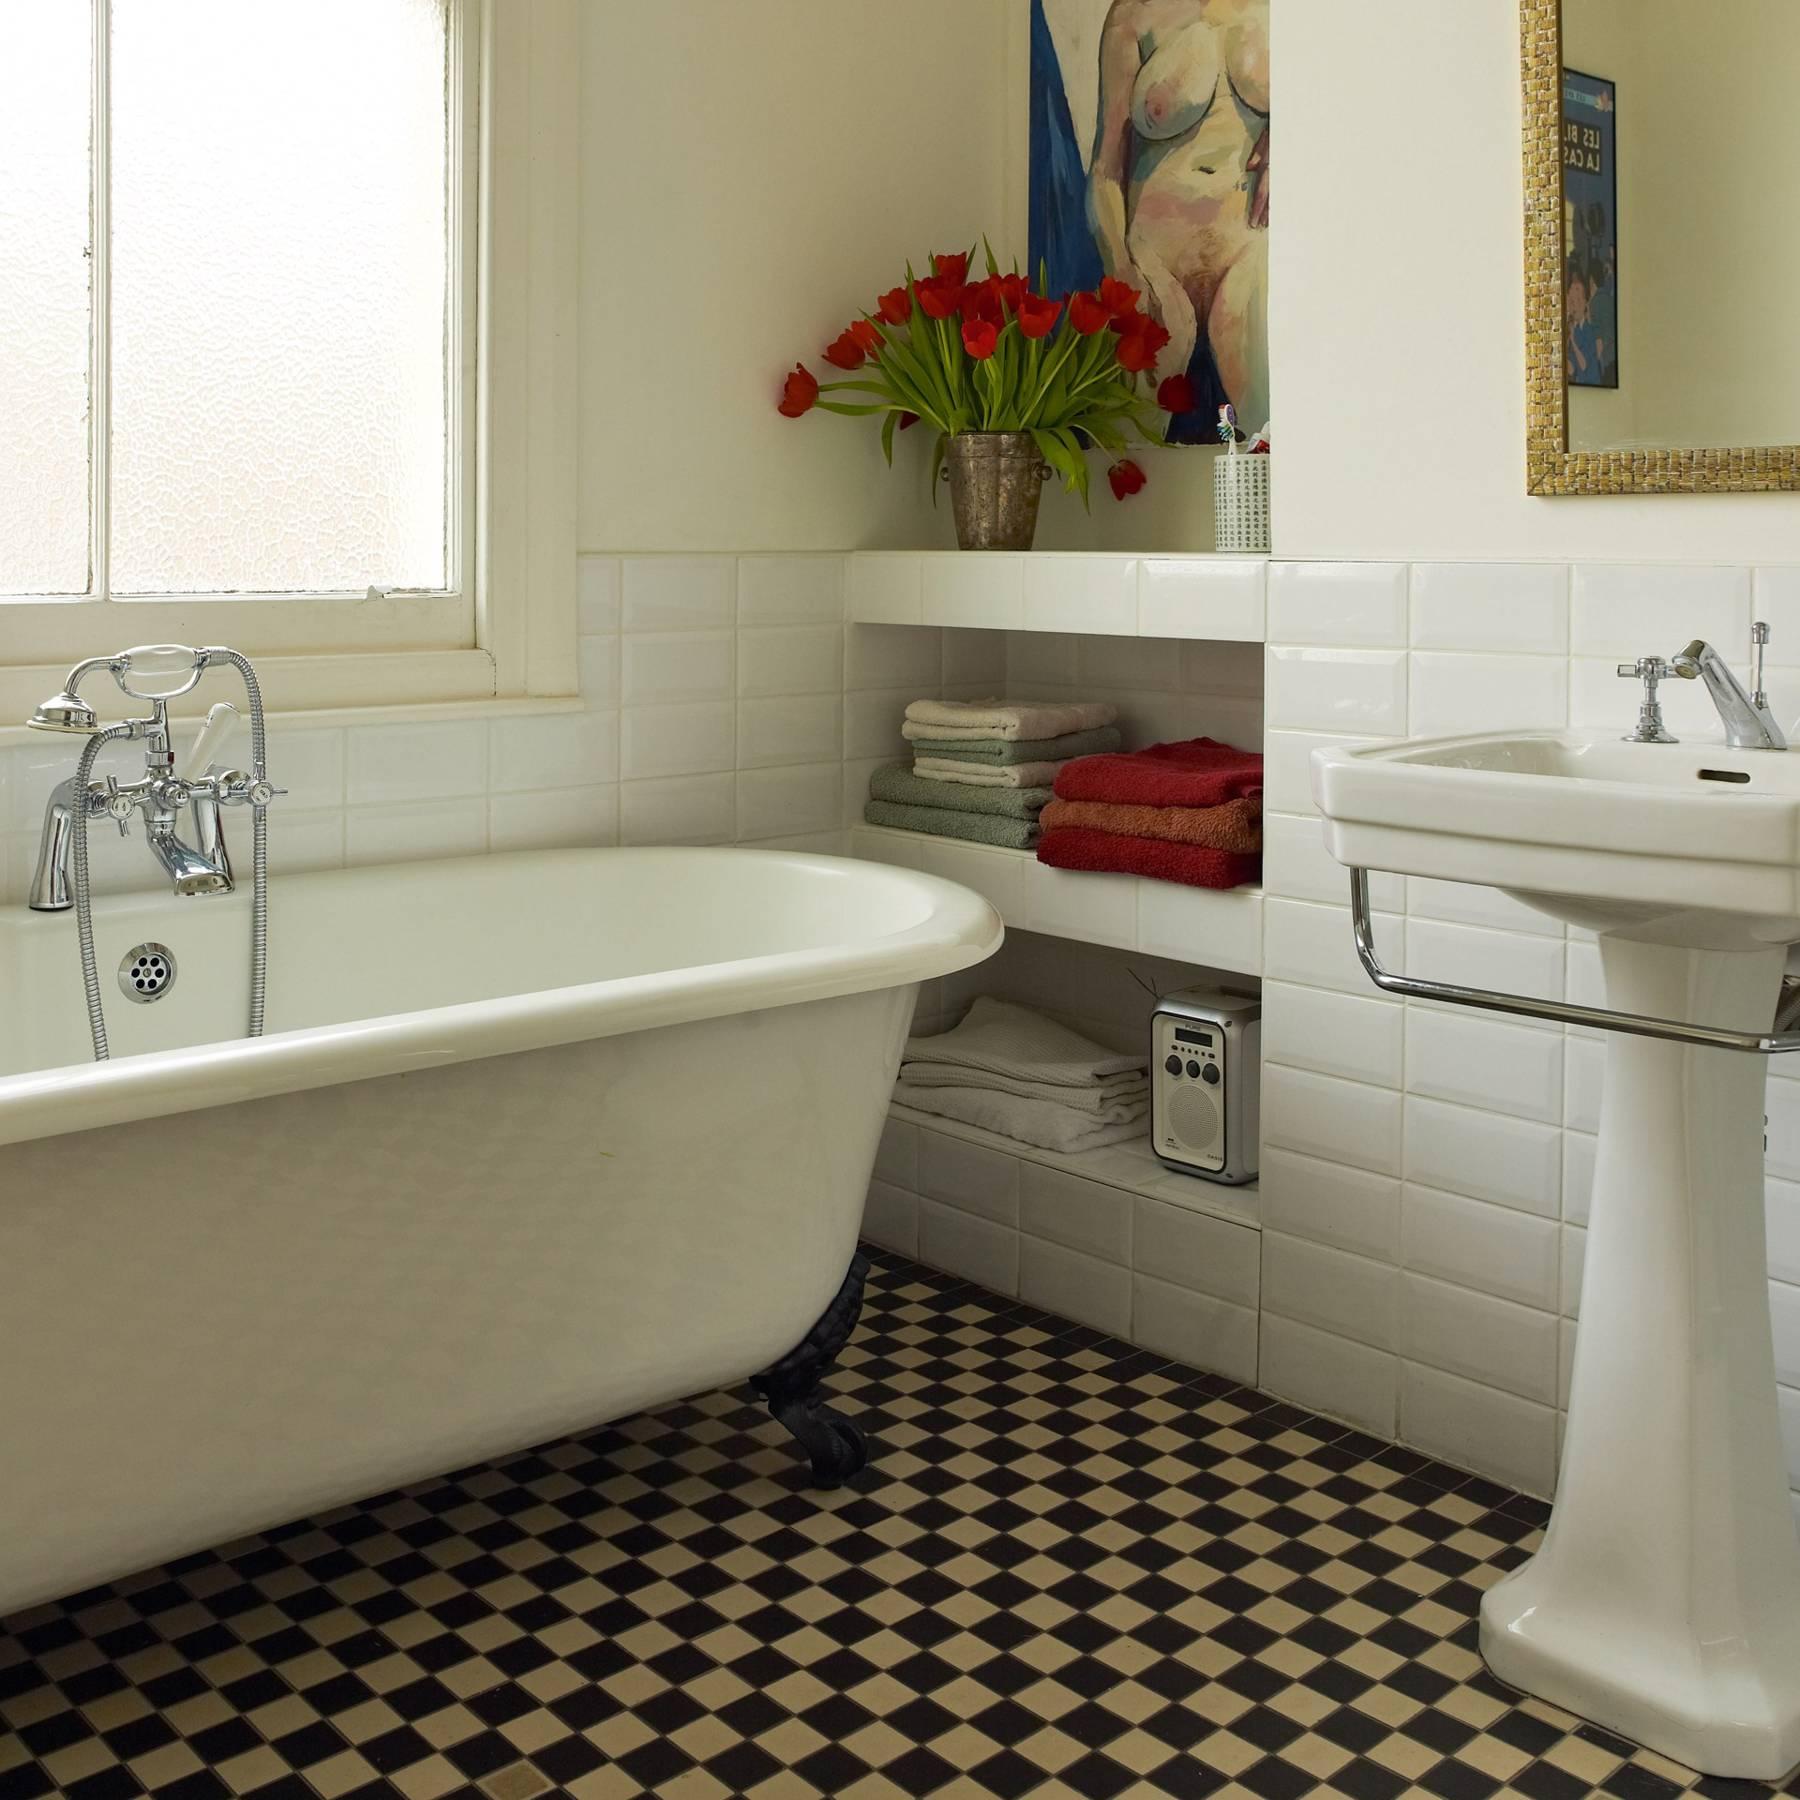 Victorian Ceramic Bathroom Tiles, Victorian Style Bathroom Floor Tiles